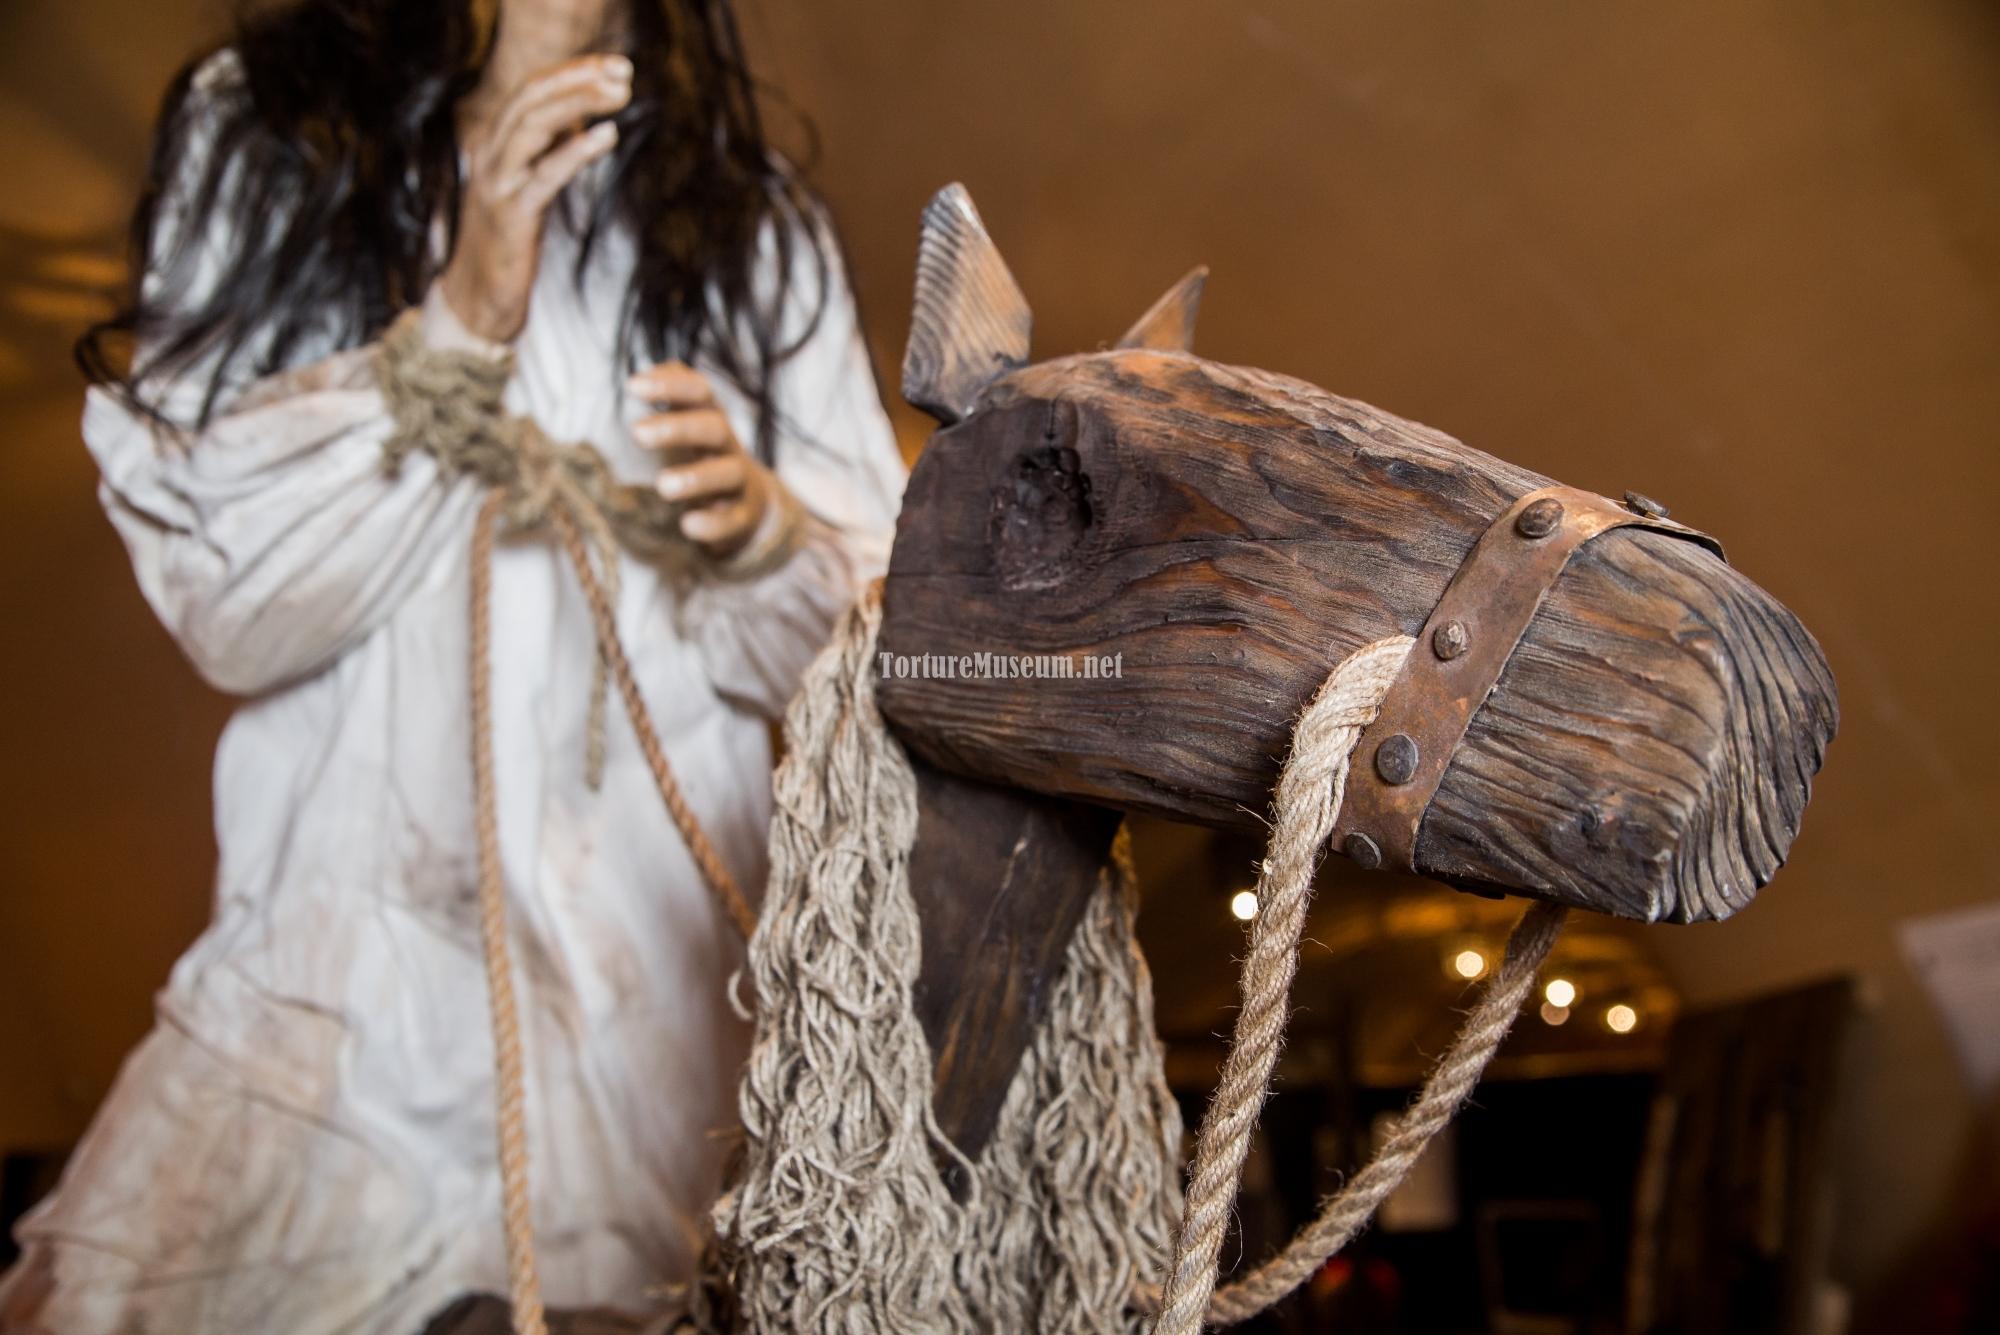 The Spanish Horse | Torture Museum